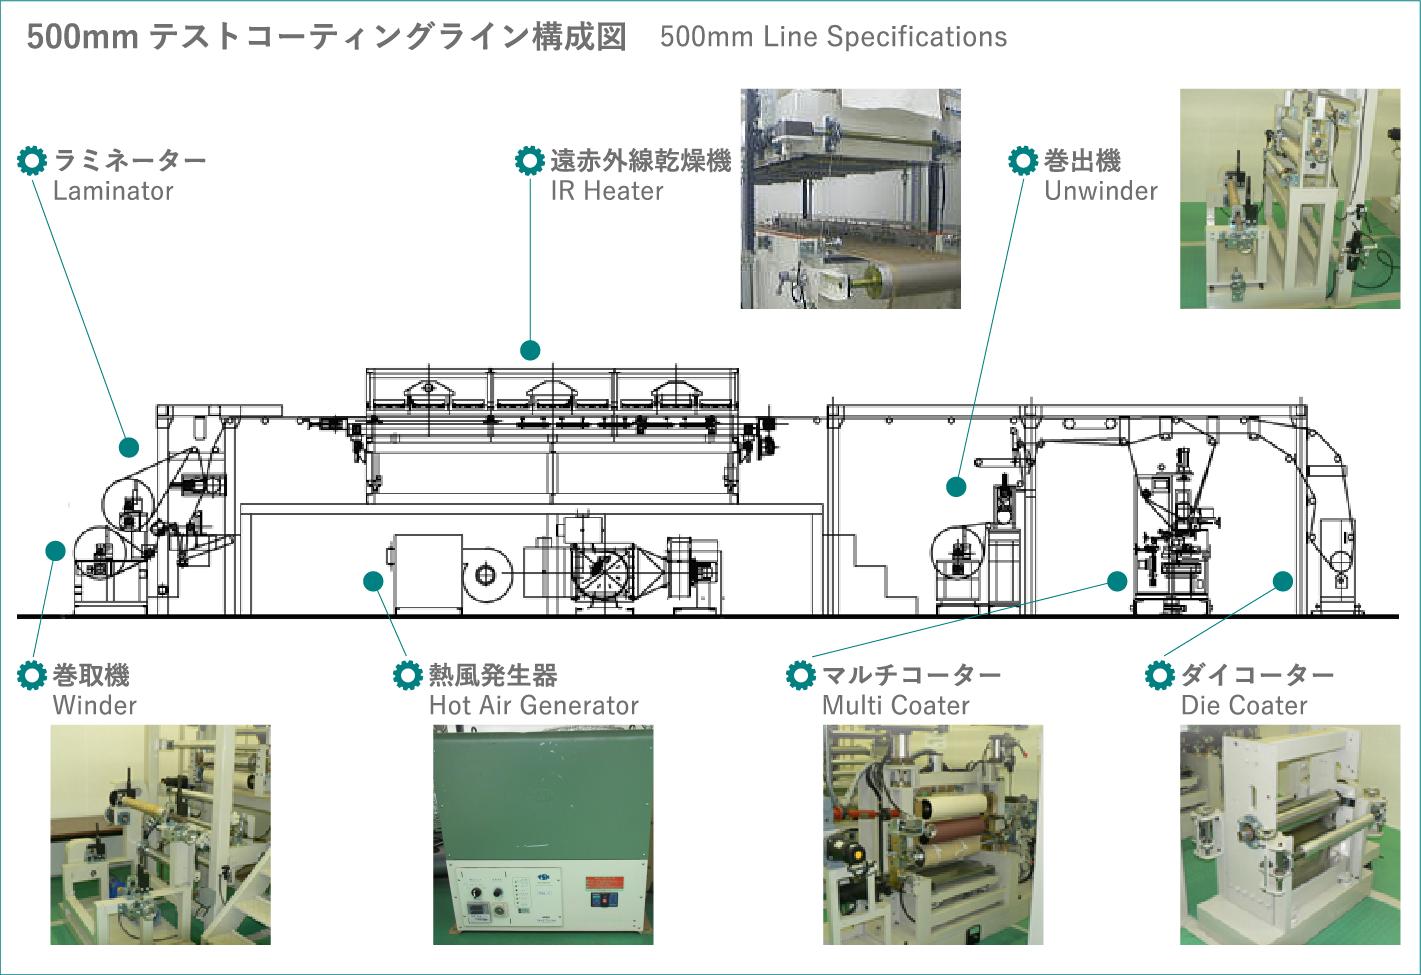 500mmテストコーティングライン構成図 500mm Line Specifications